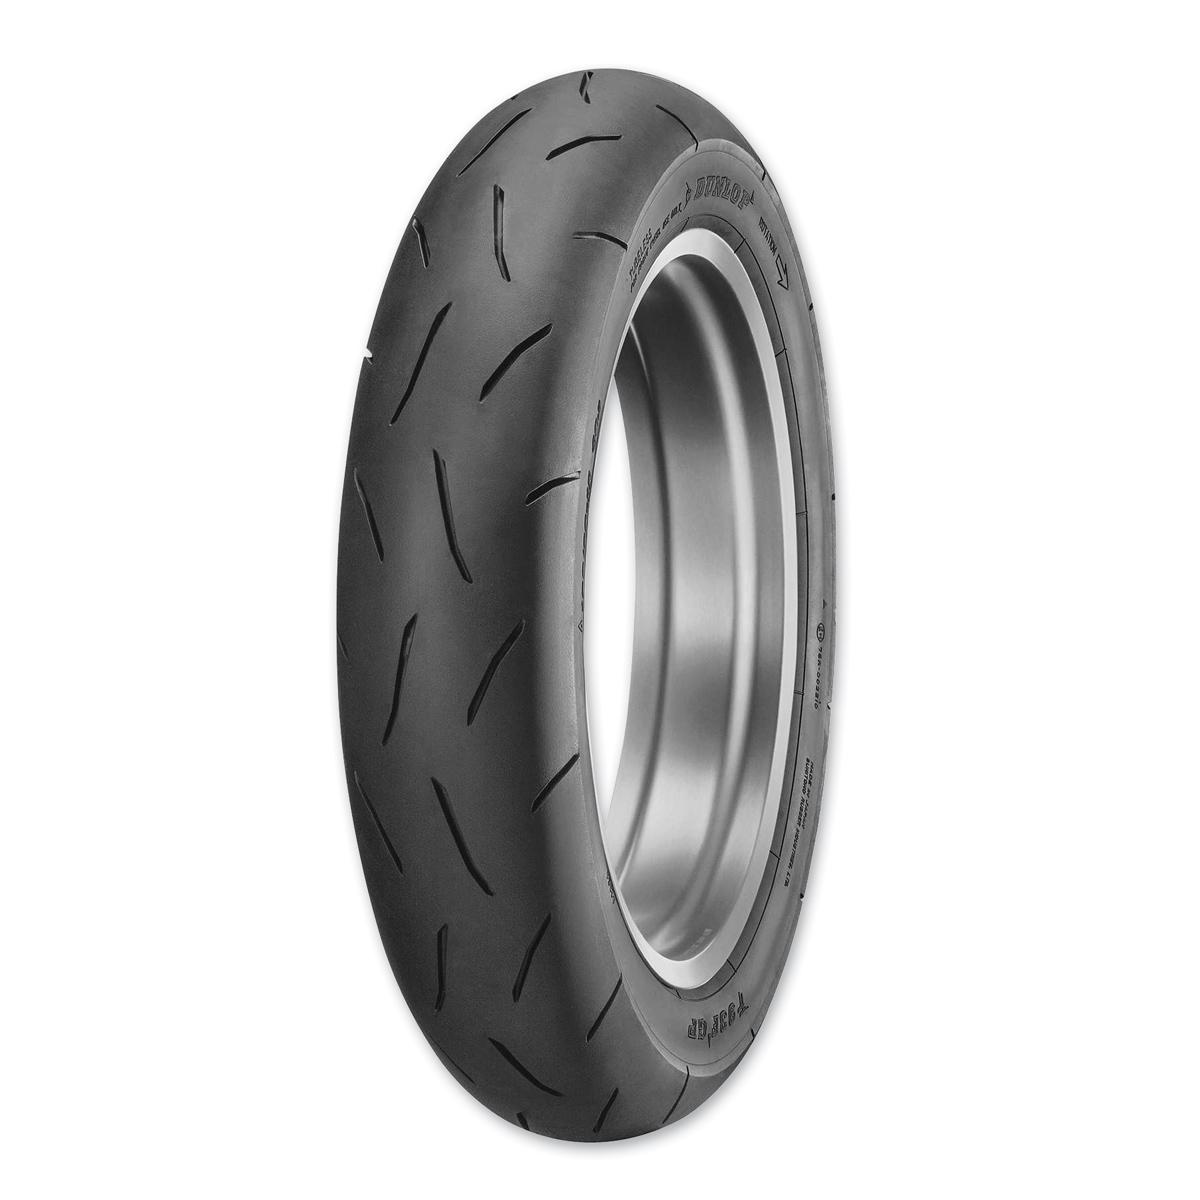 Dunlop TT93 GP Mini Race 100/90-12 Front Tire